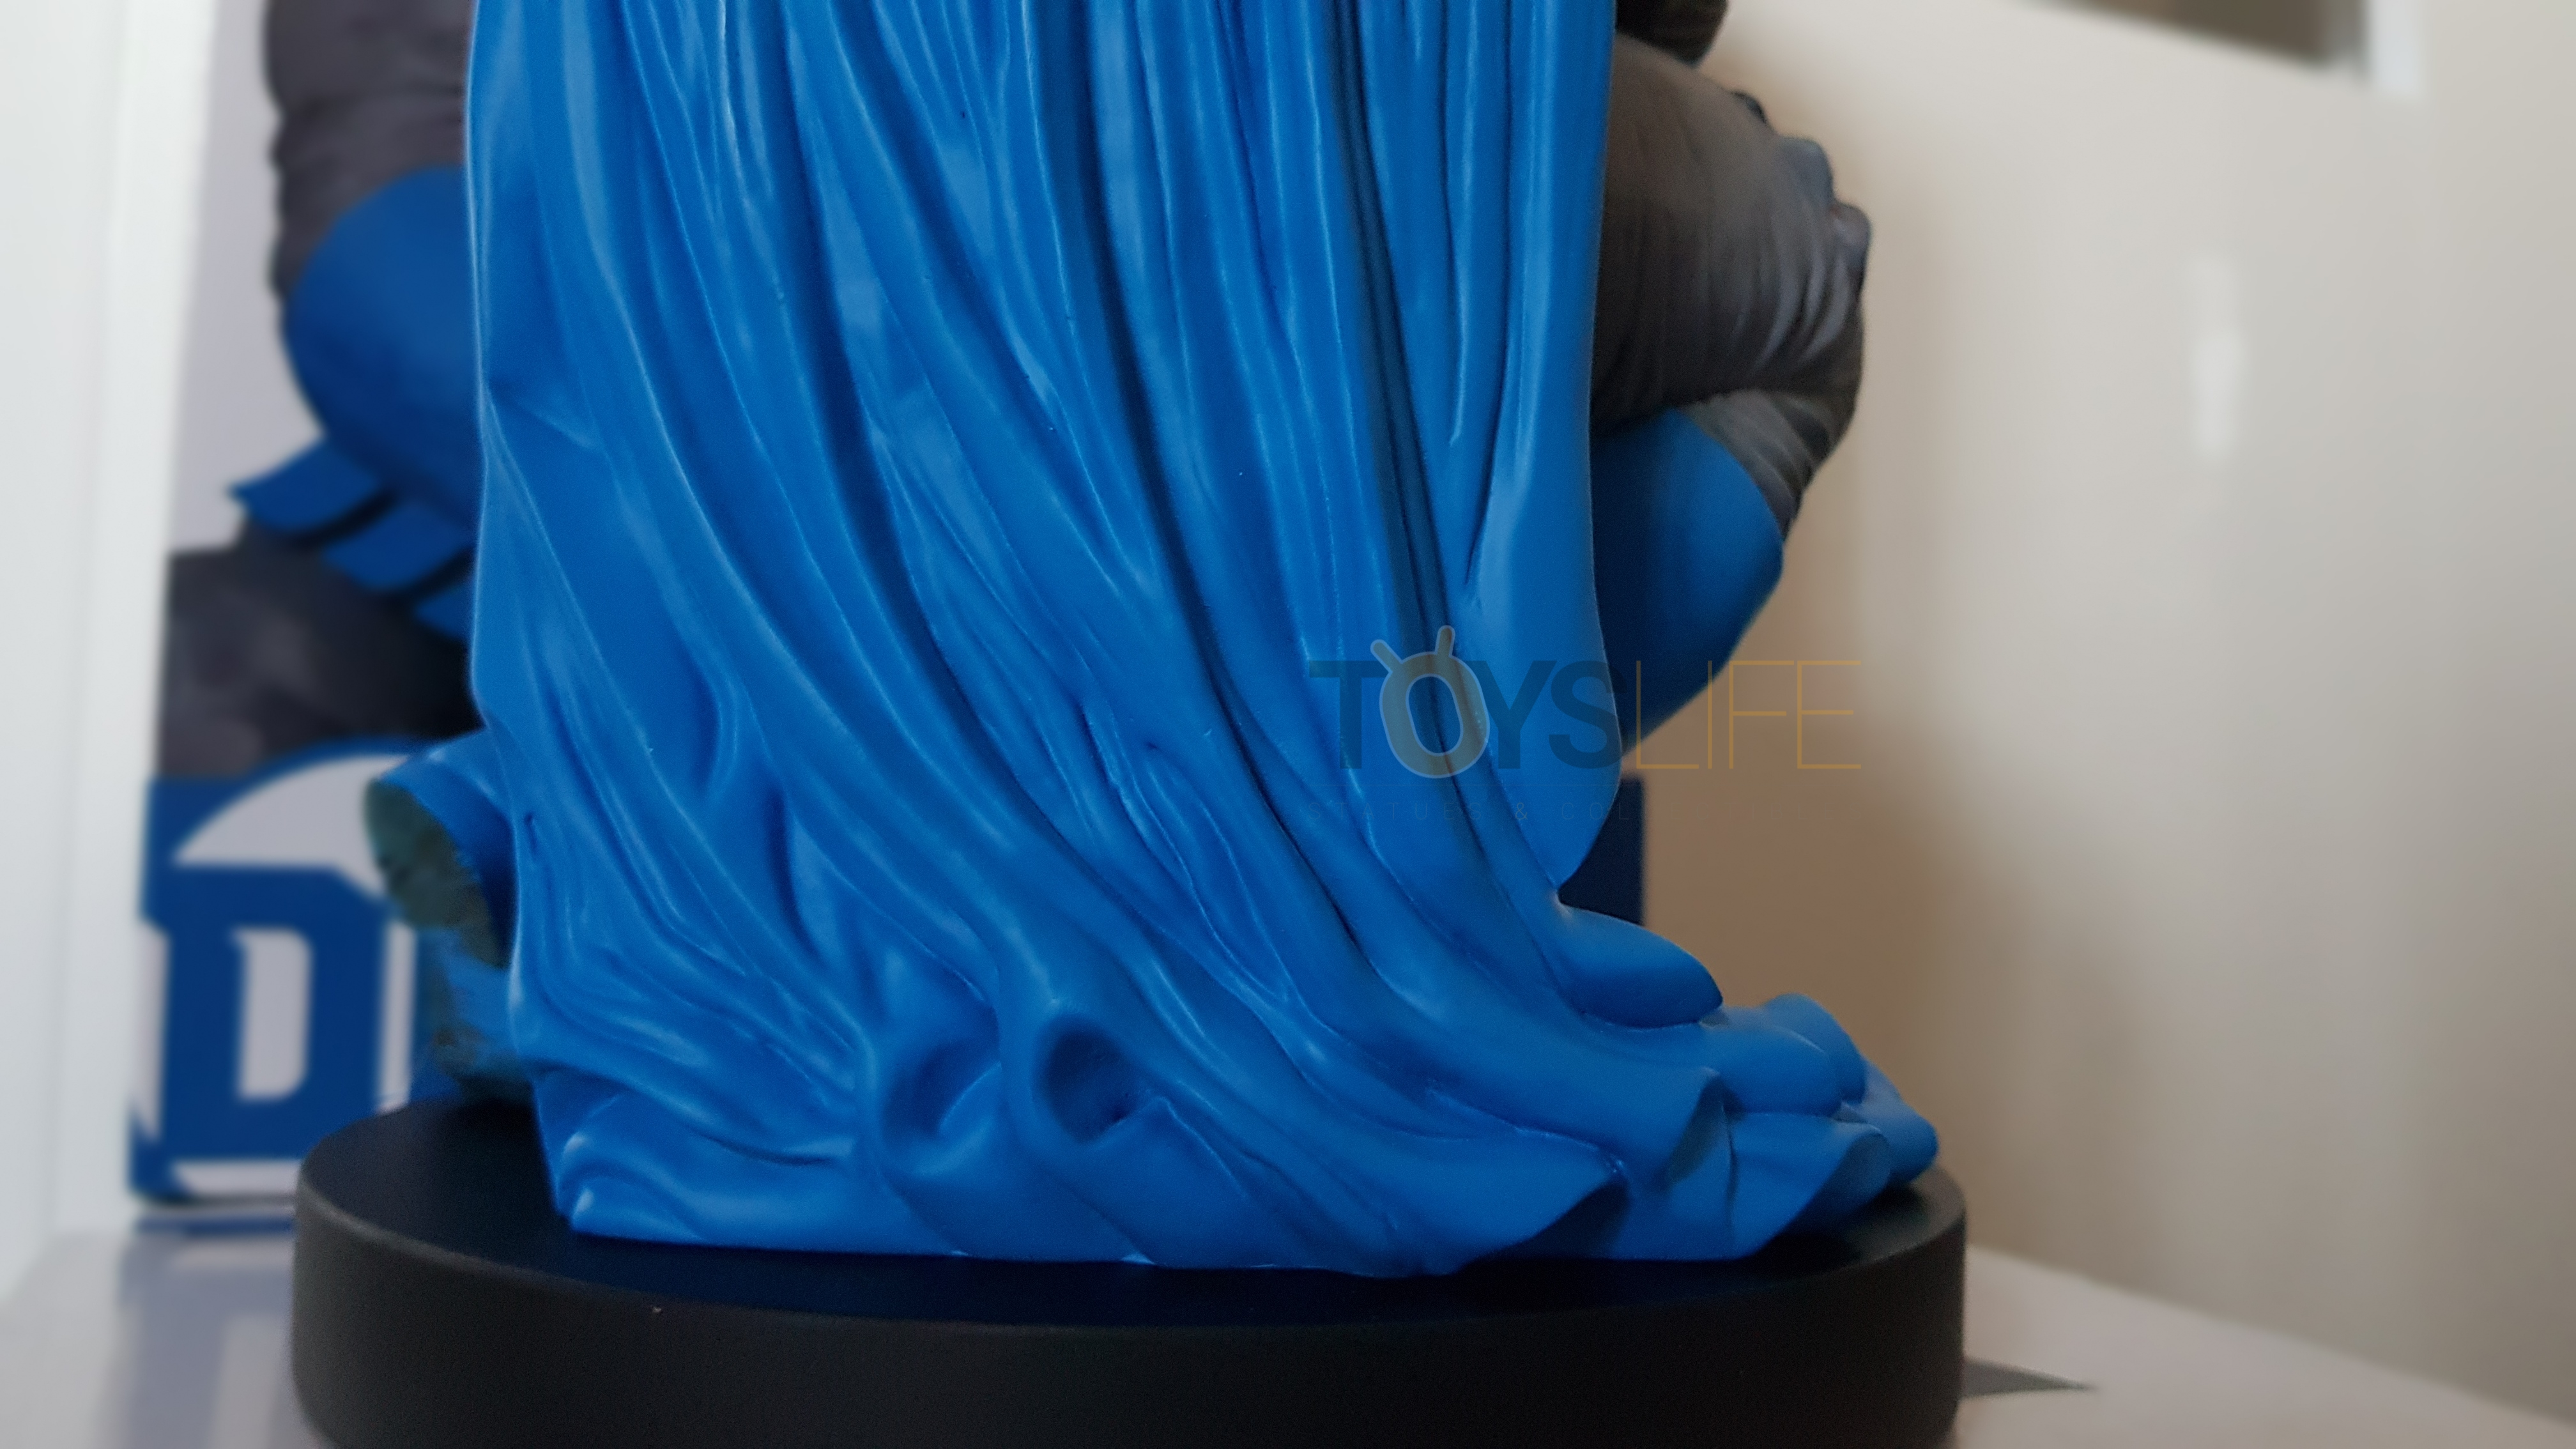 dc-designer-batman-by-frank-miller-statue-toyslife-review-12